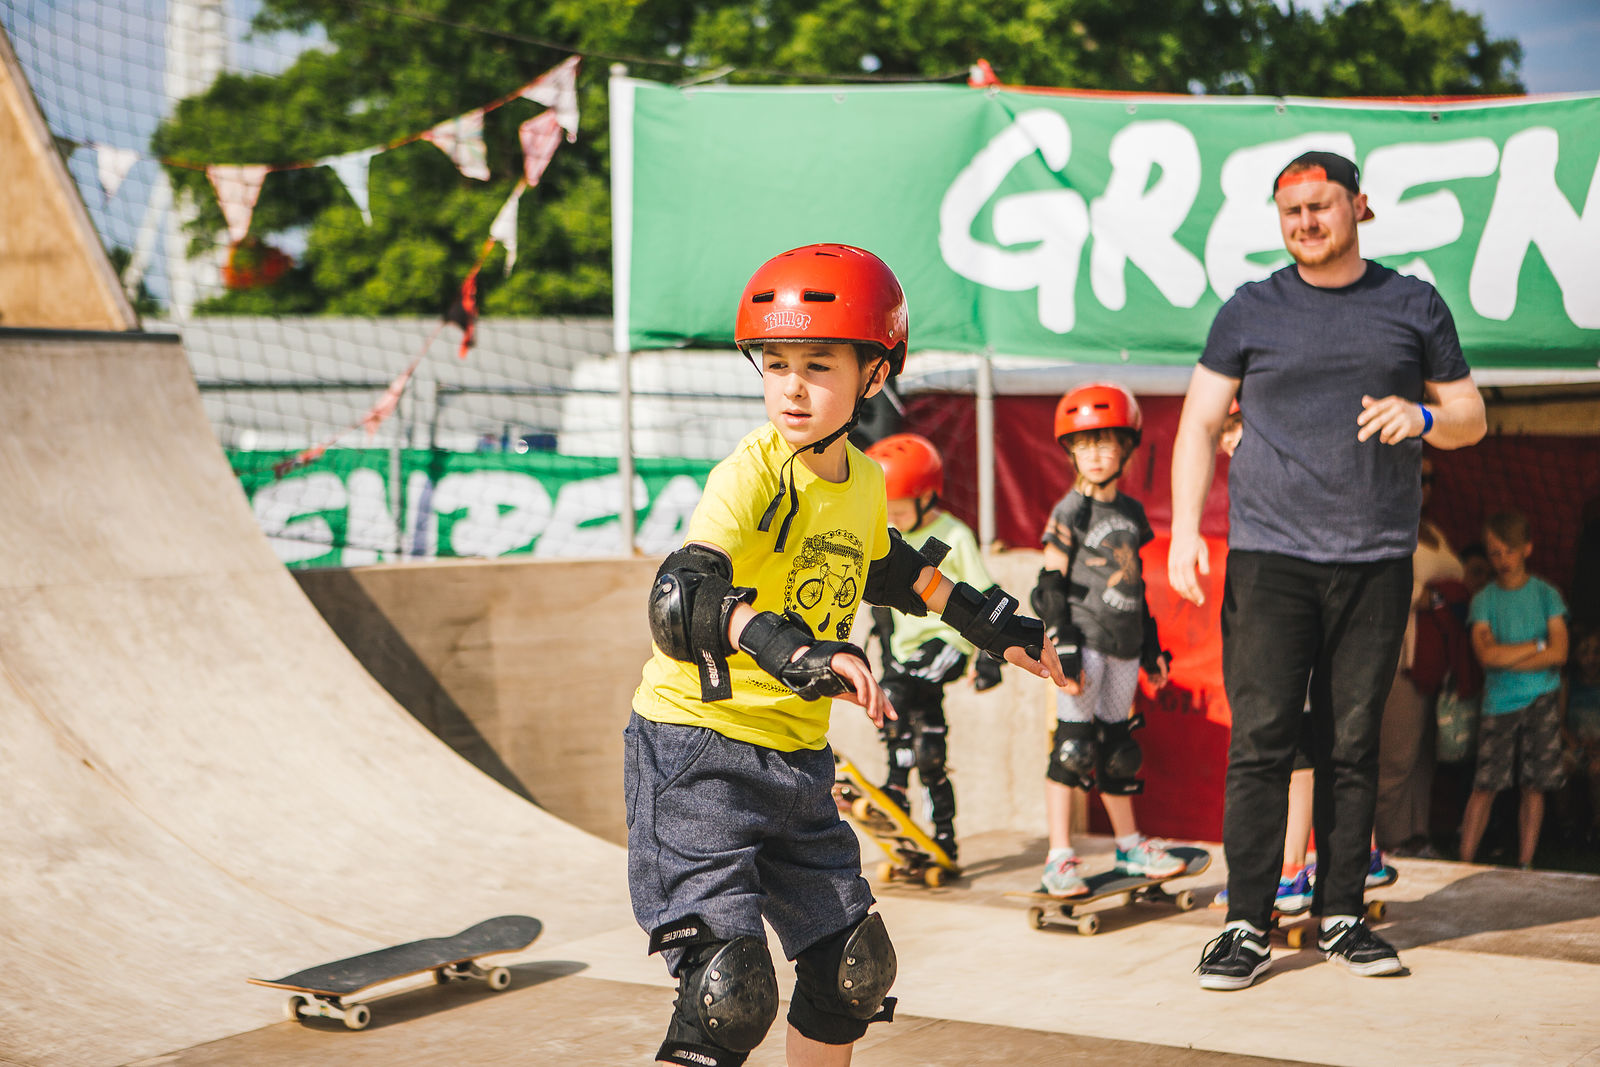 Greenpeace Skate Ramp